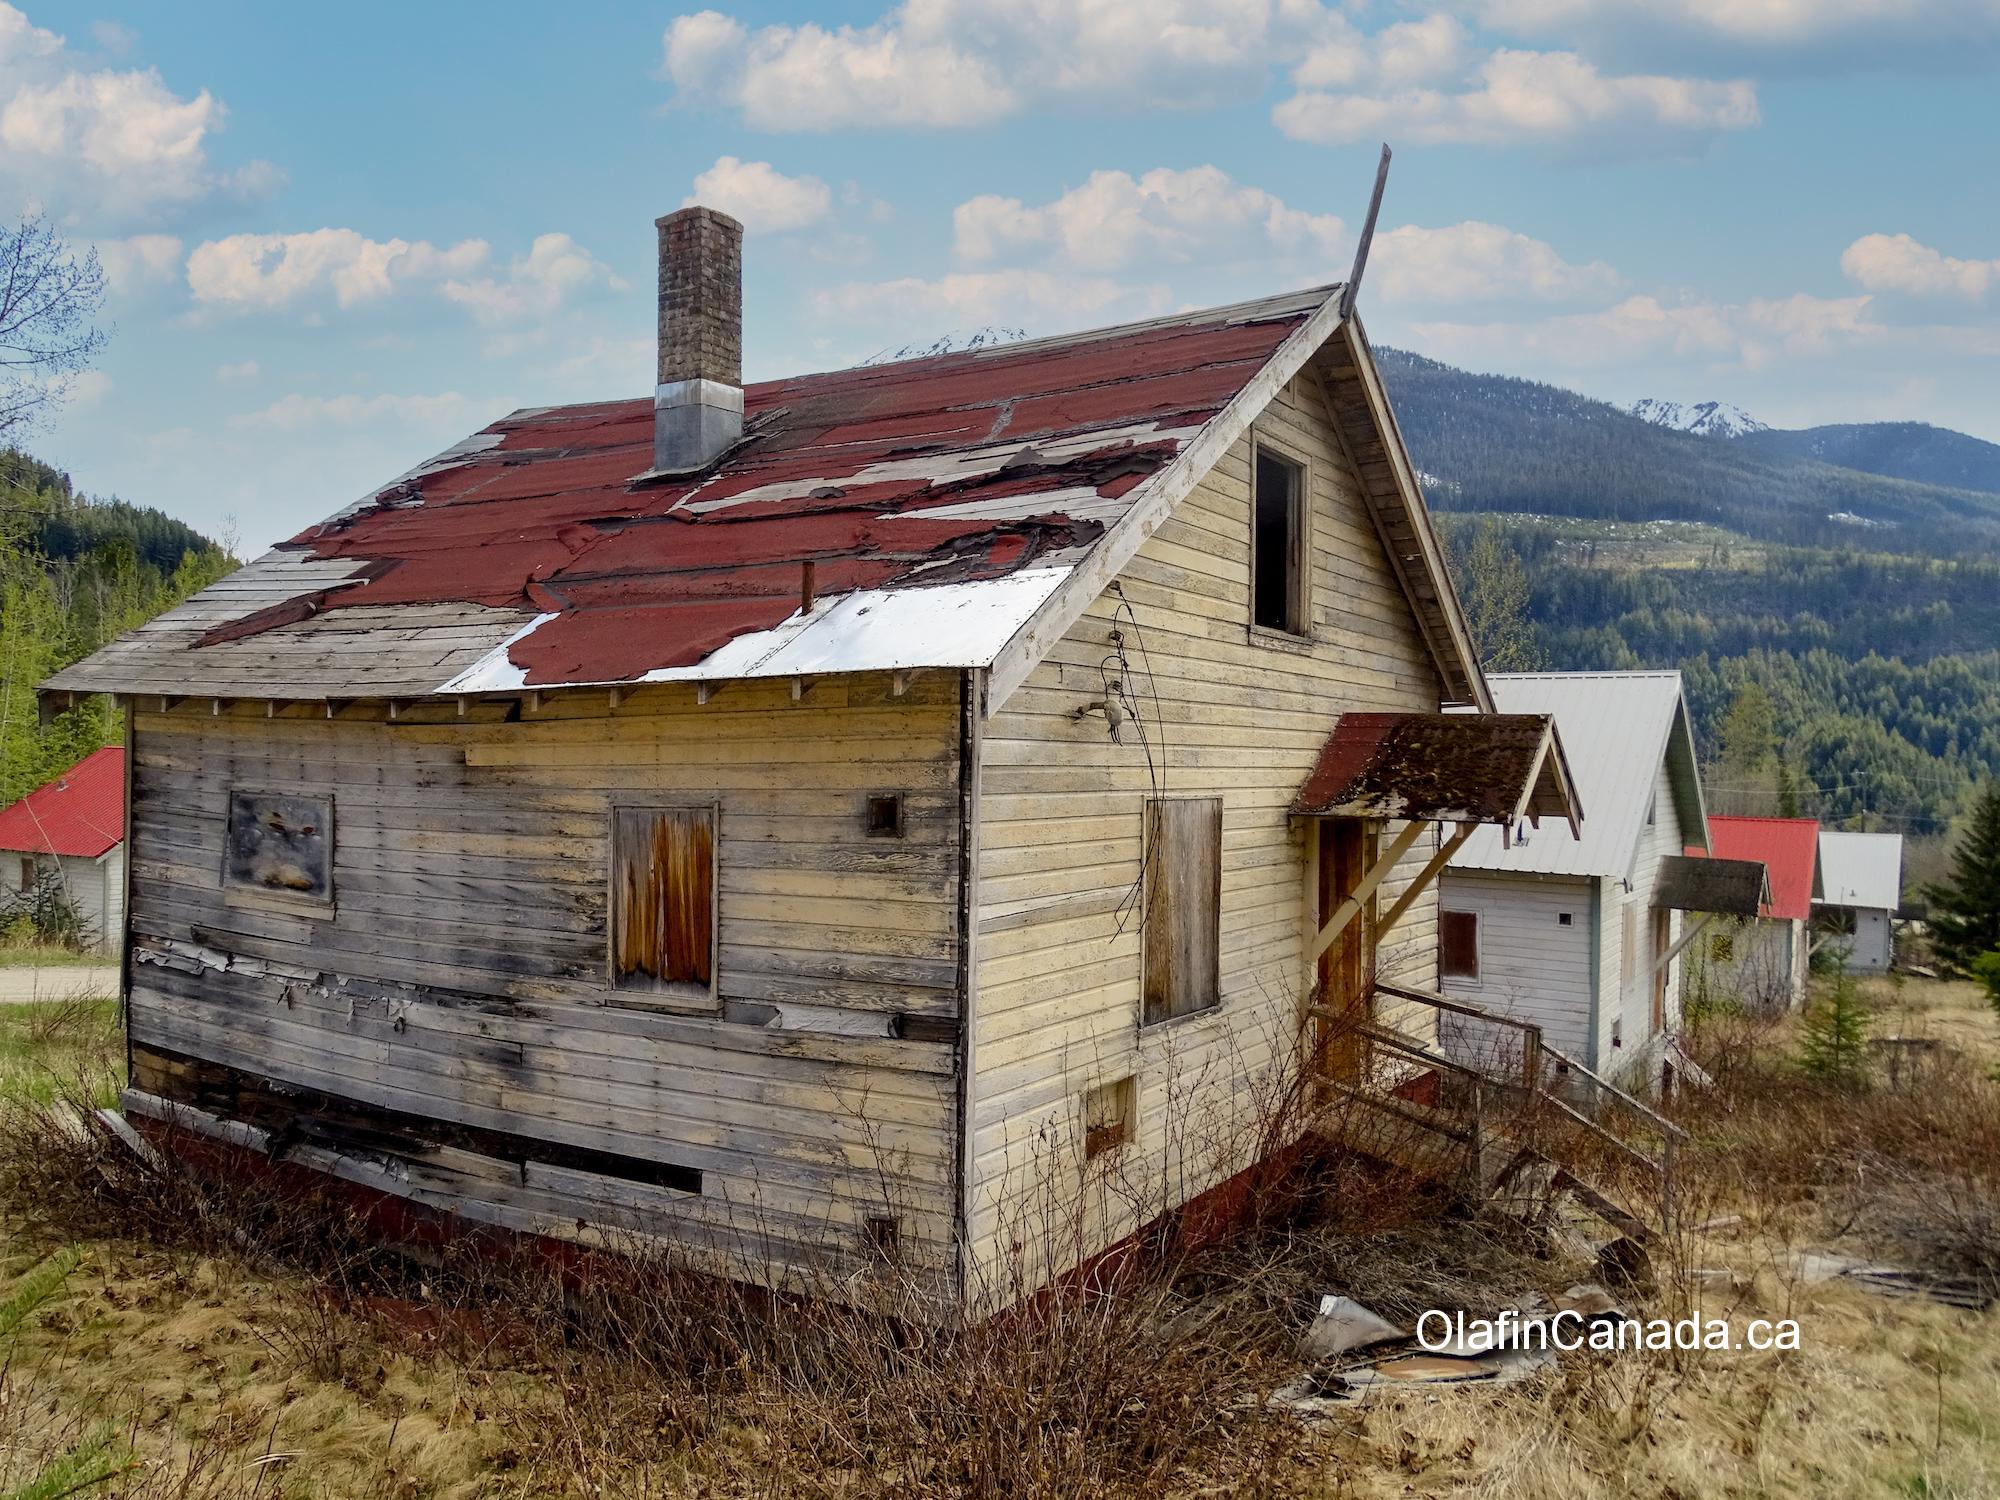 Backyards of deserted houses on Pineridge Drive Bradian, BC. #olafincanada #britishcolumbia #discoverbc #abandonedbc #bradian